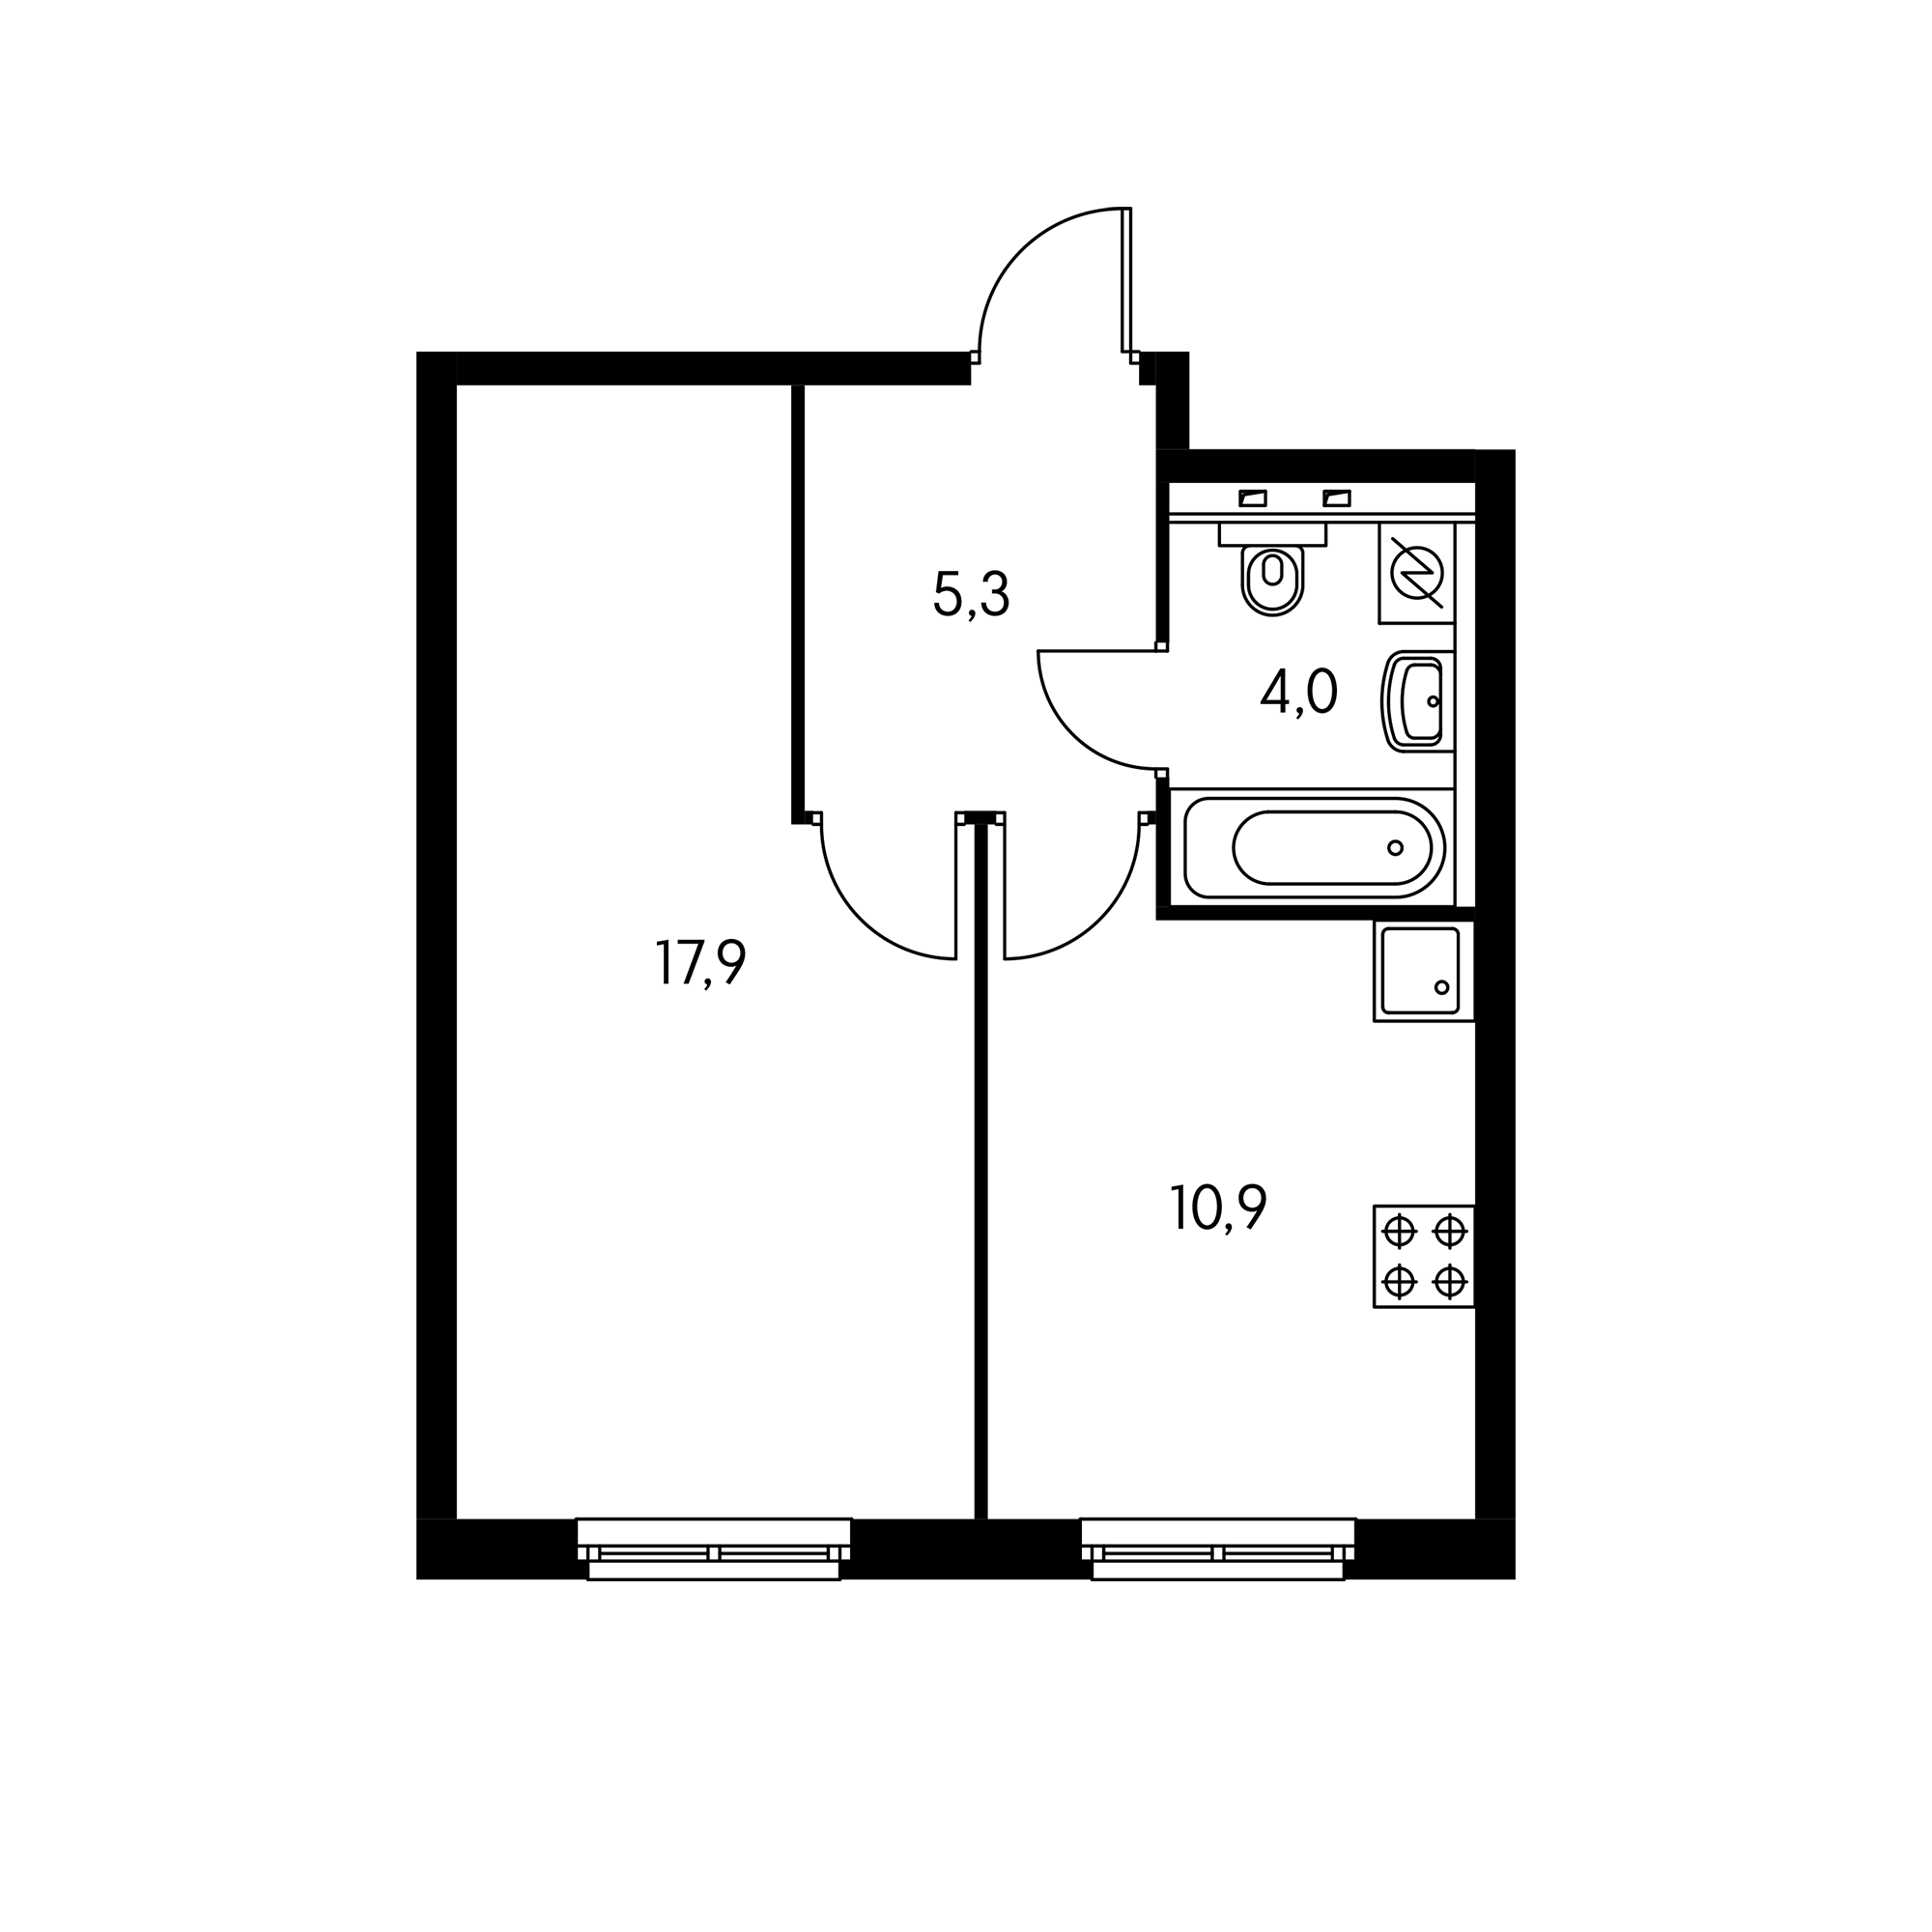 1KM1_6.3-1_2